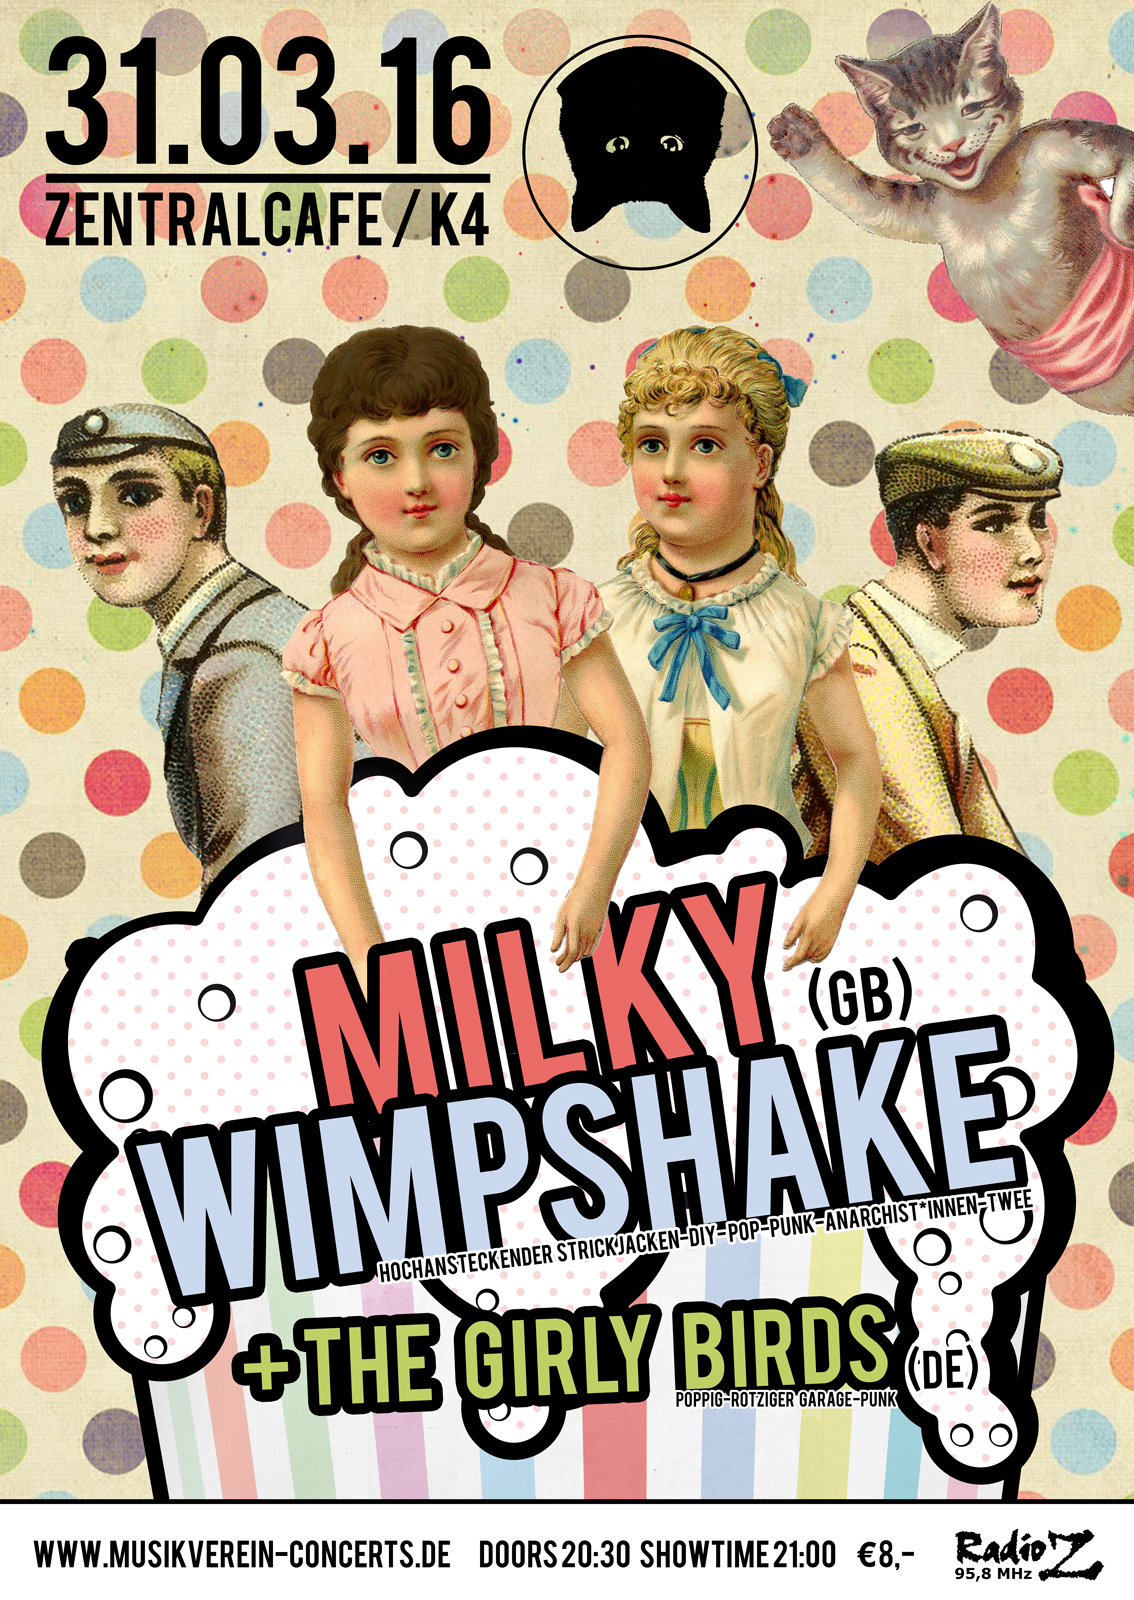 160309_milkywimpshake_girlybirds